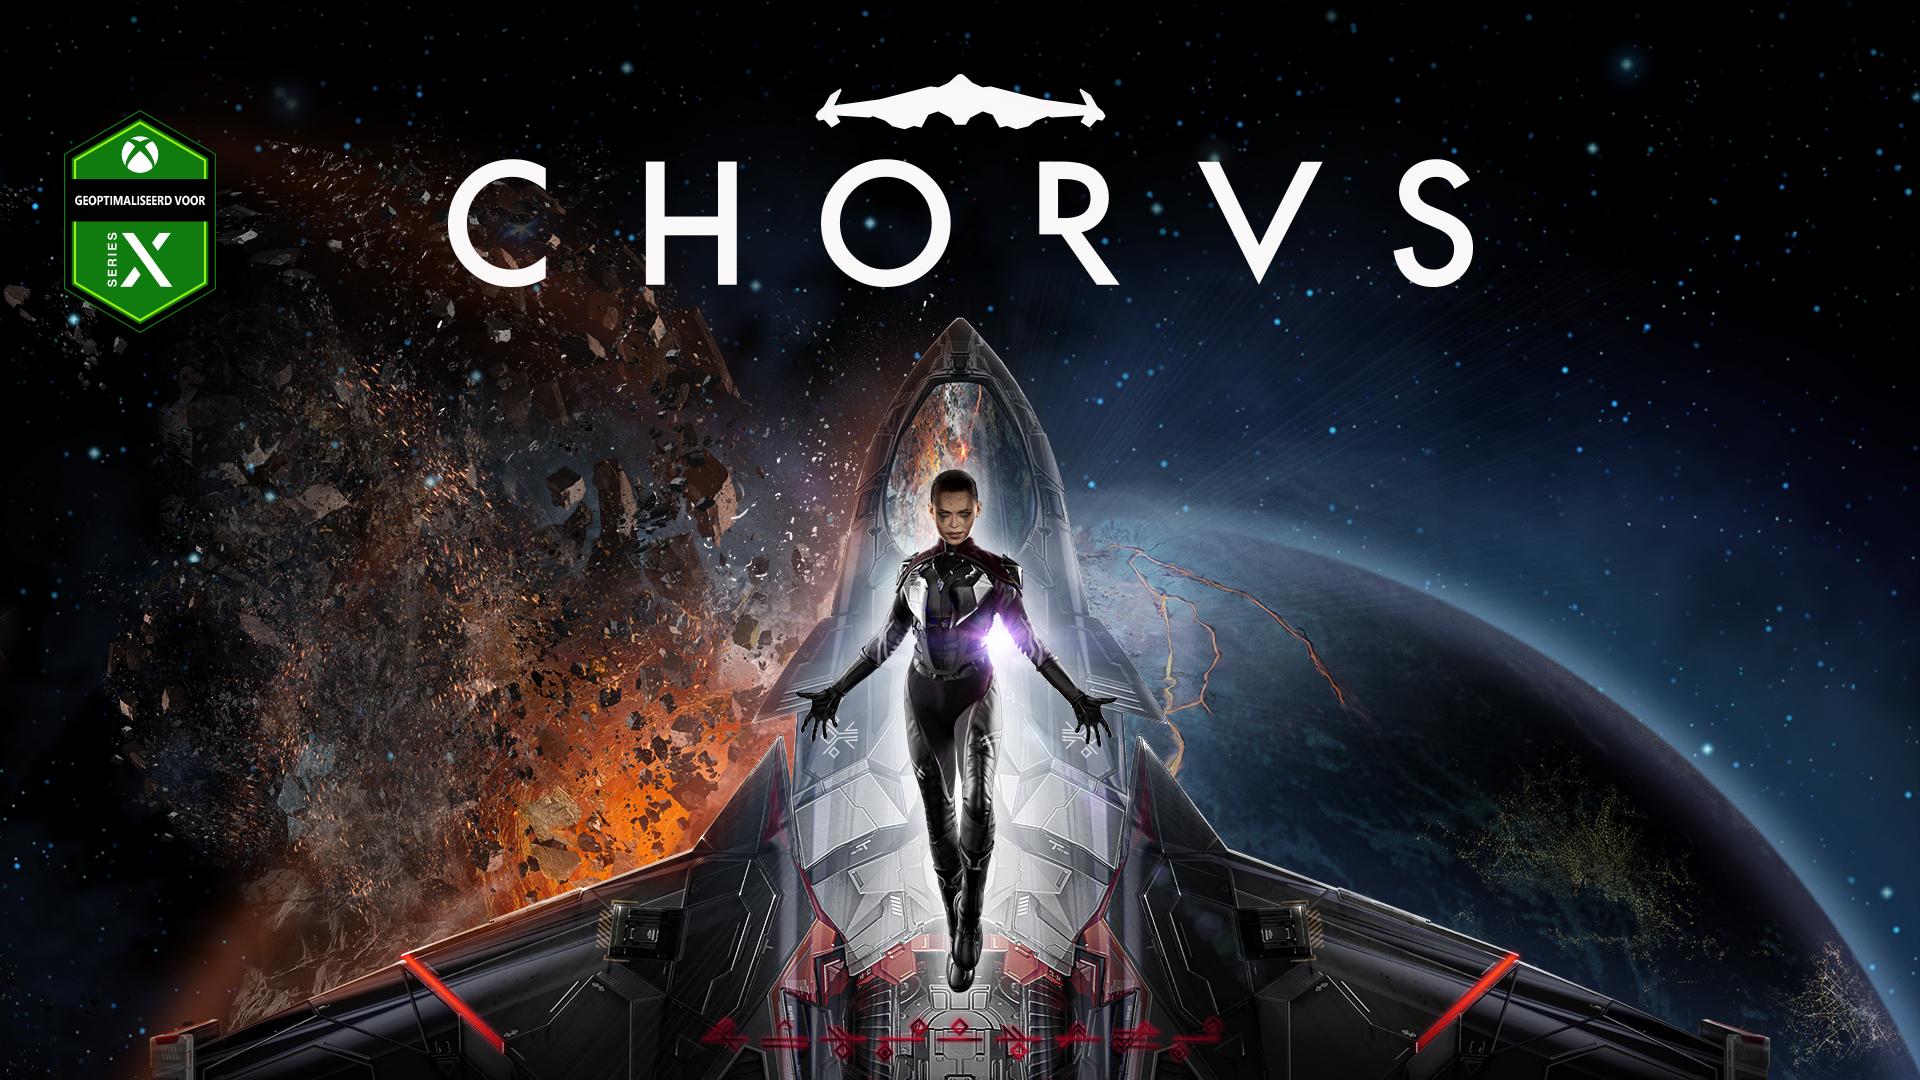 Key art van de game Chorus.